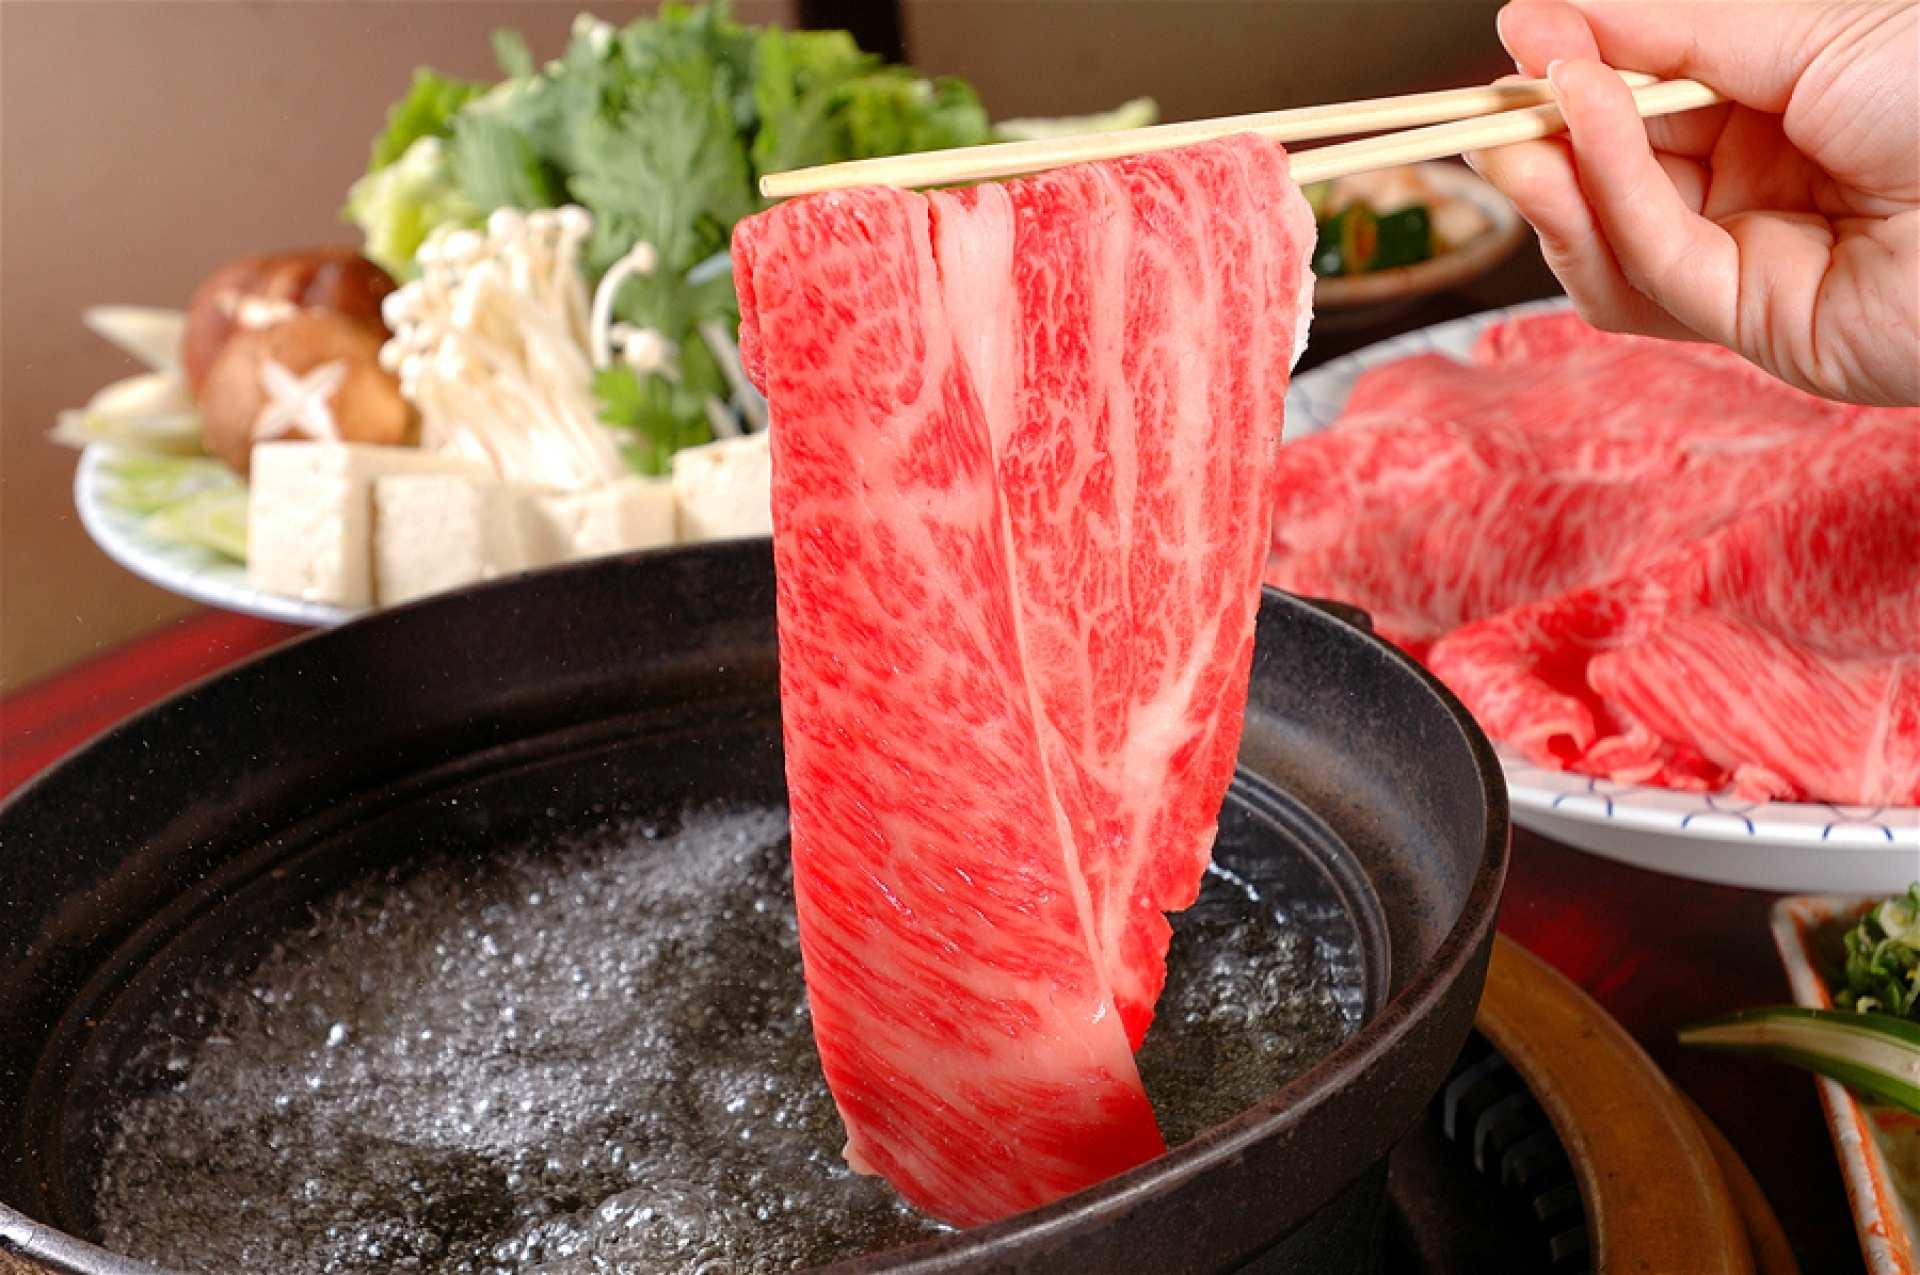 【常年排隊人氣涮鍋】しゃぶ菜・松阪牛螃蟹吃到飽・軟飲無限暢飲